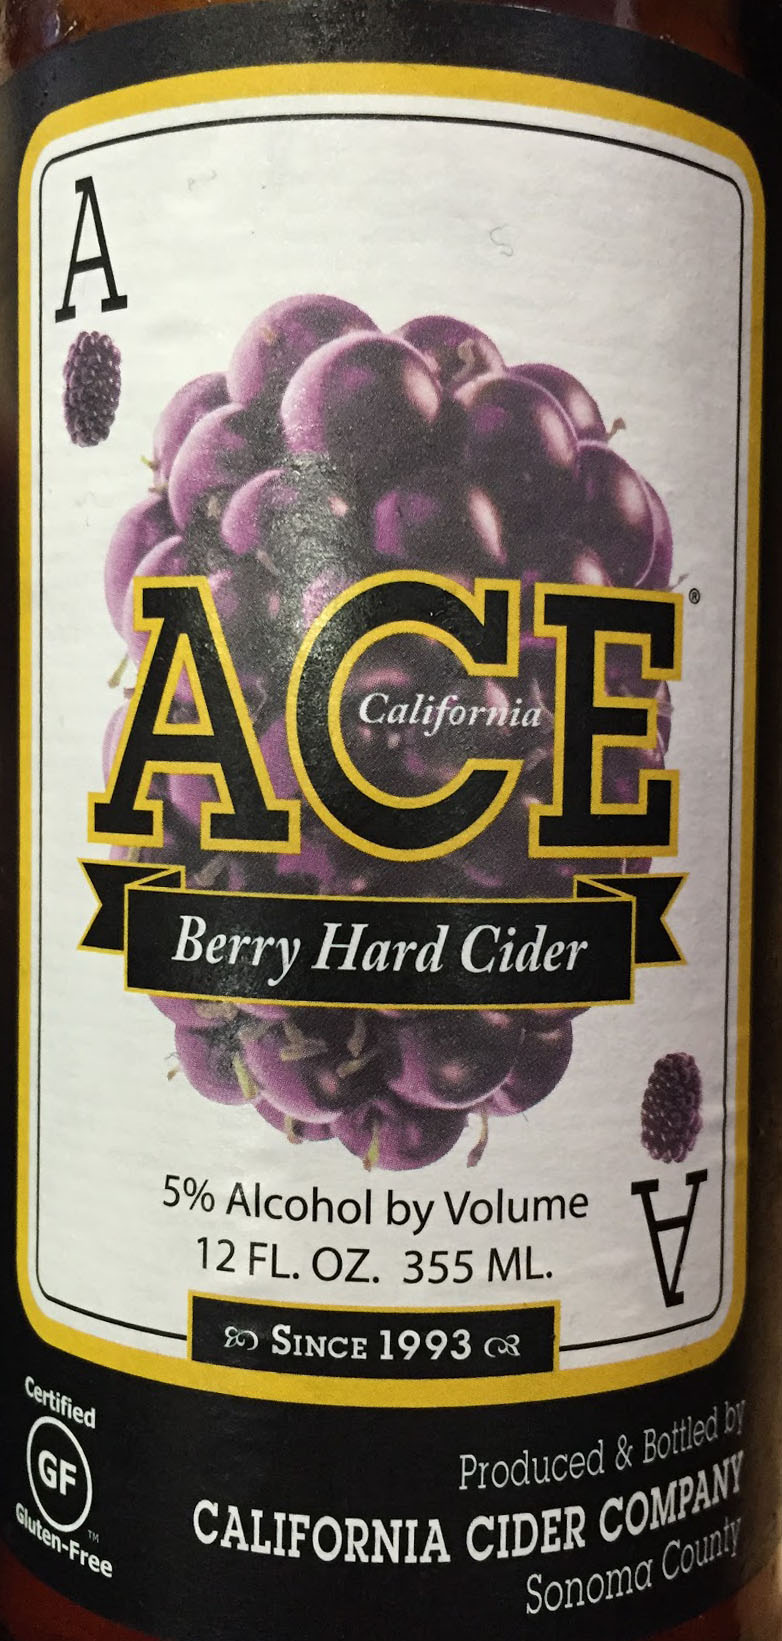 Berry Hard Cider